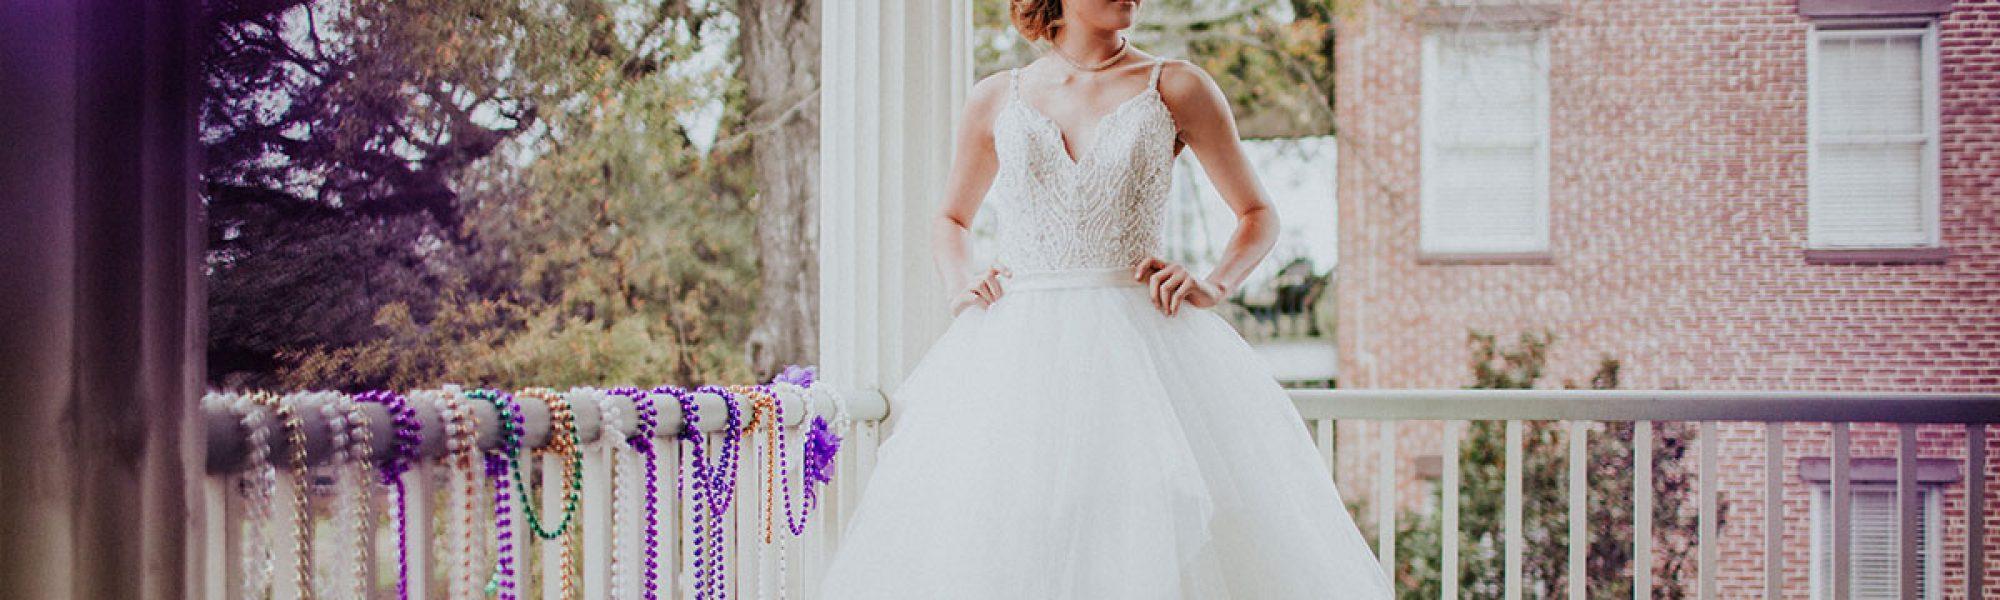 Southern Mardi Gras wedding gowns